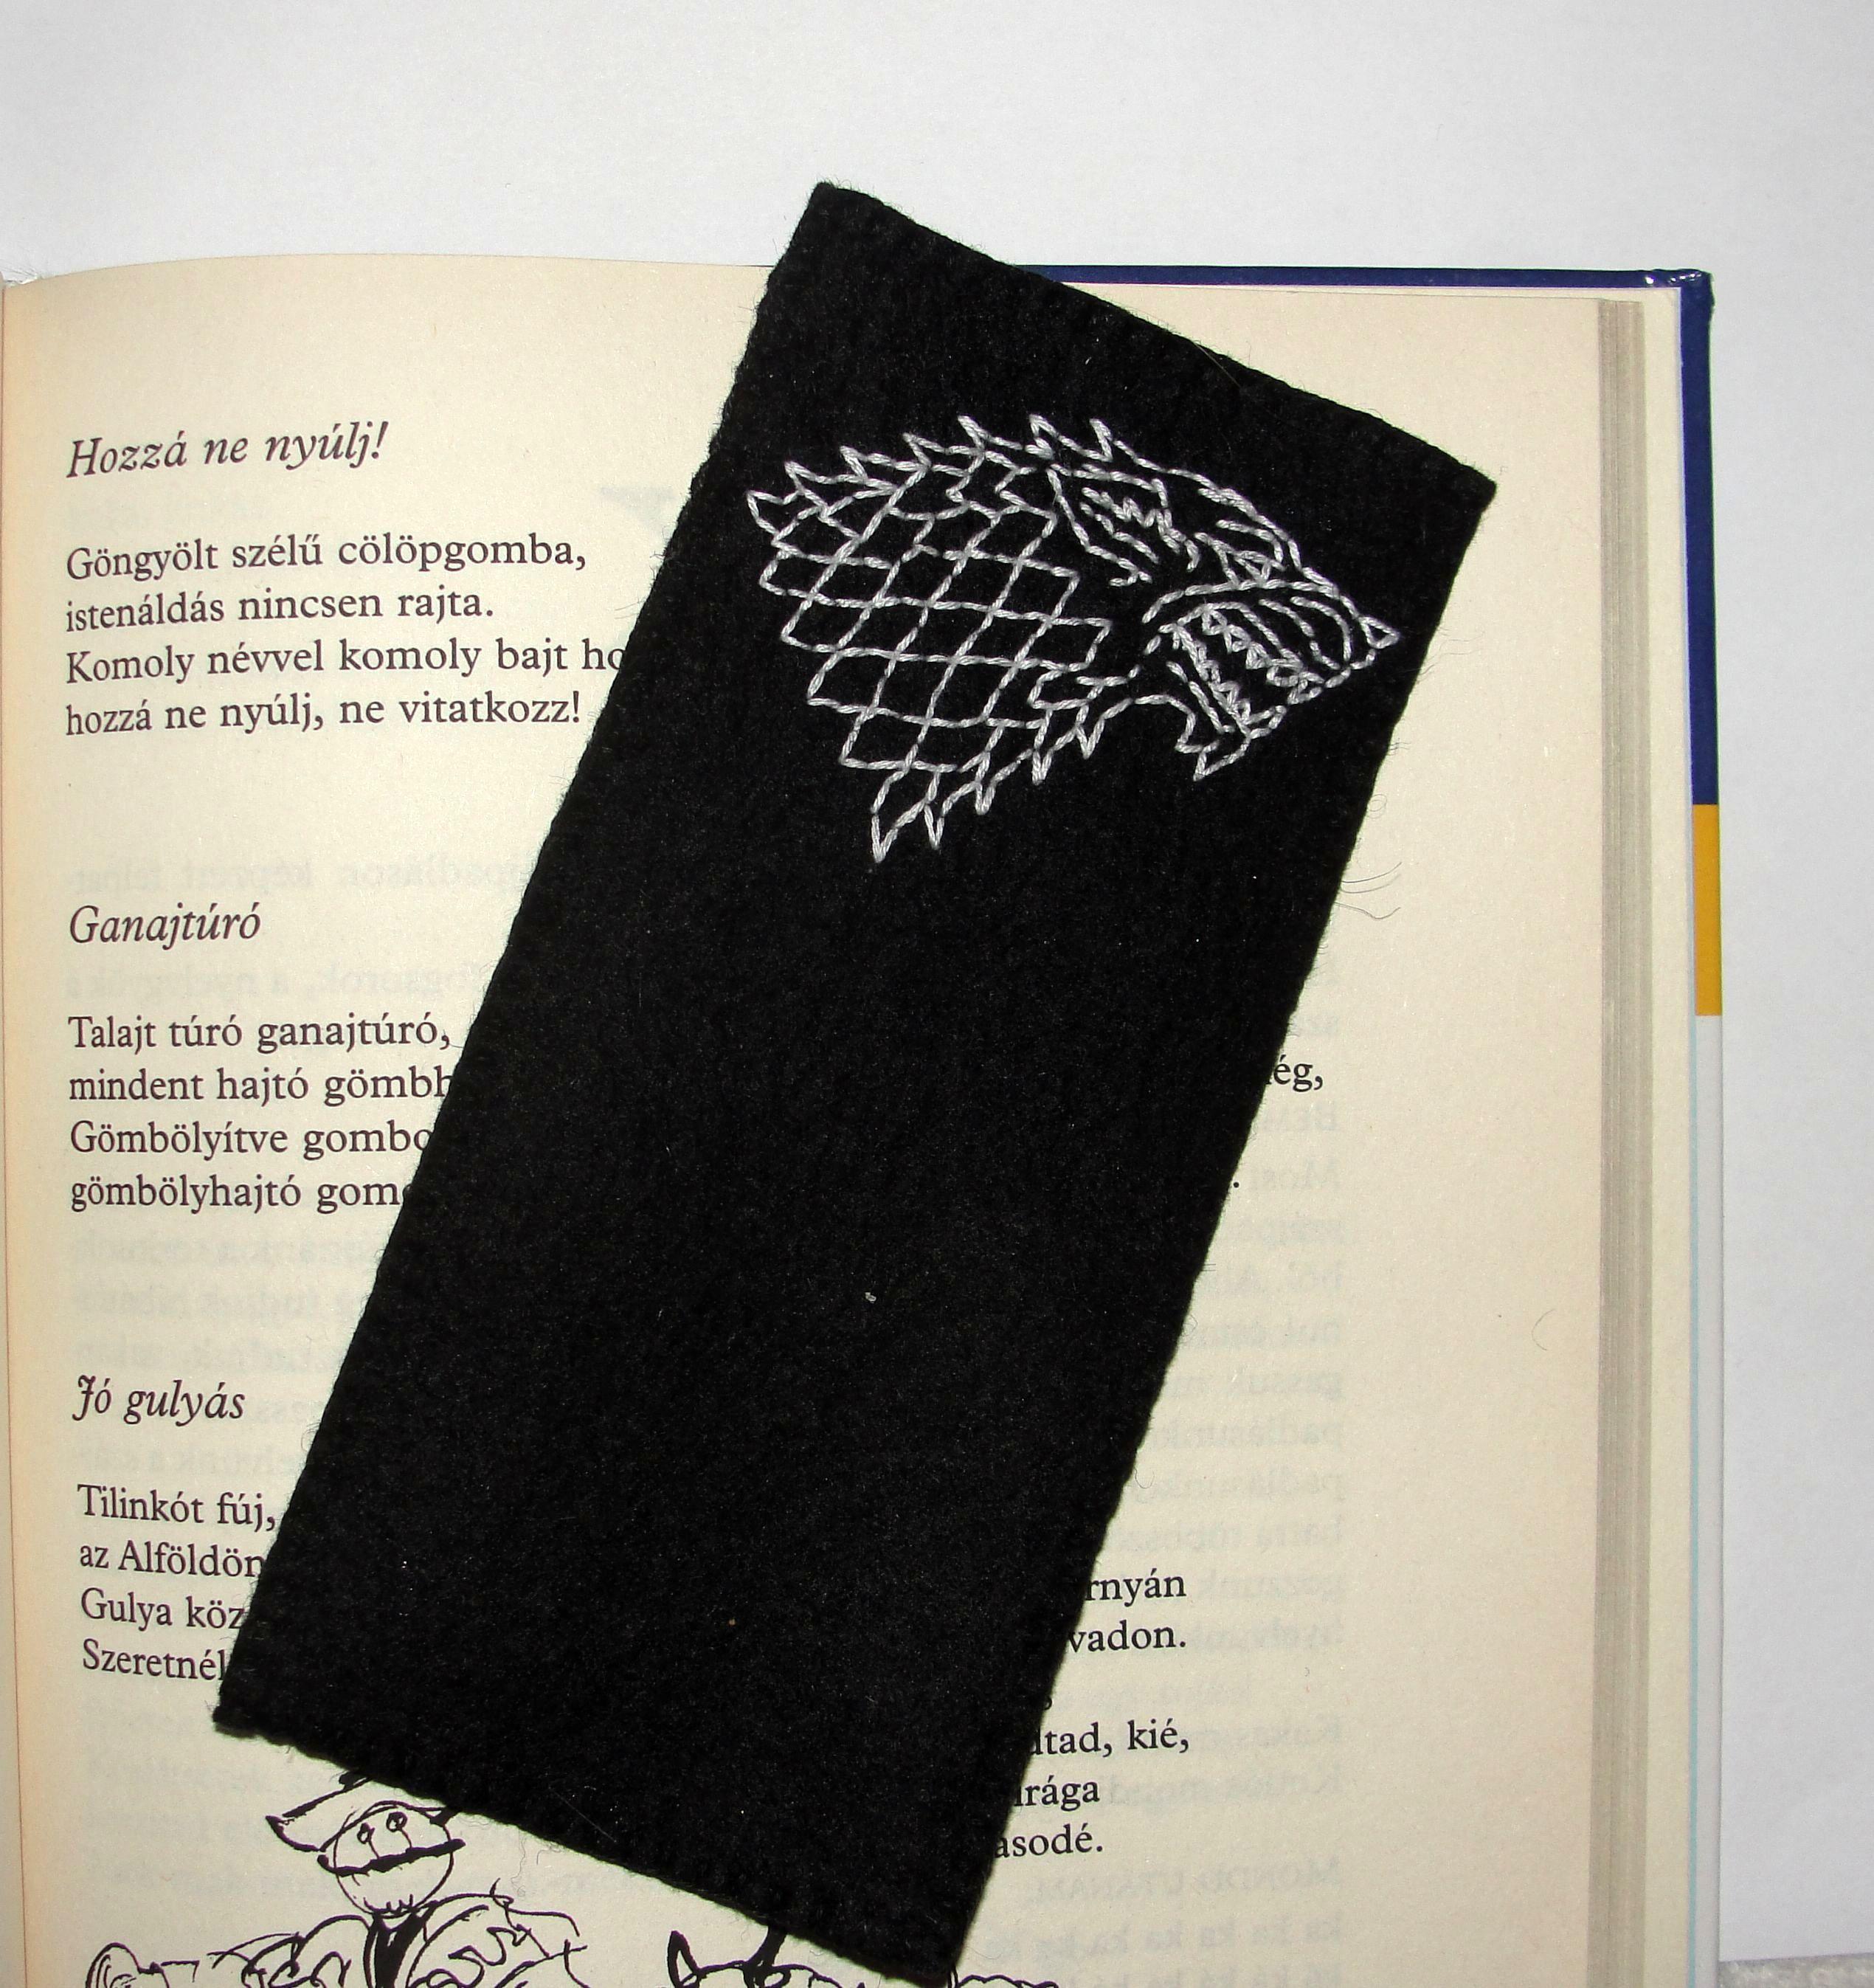 Wool Felt Wolf Bookmark Game Of Thrones Handmade Gifts Animal Bookmark Handmade Games Felt Bookmark Diy Handmade